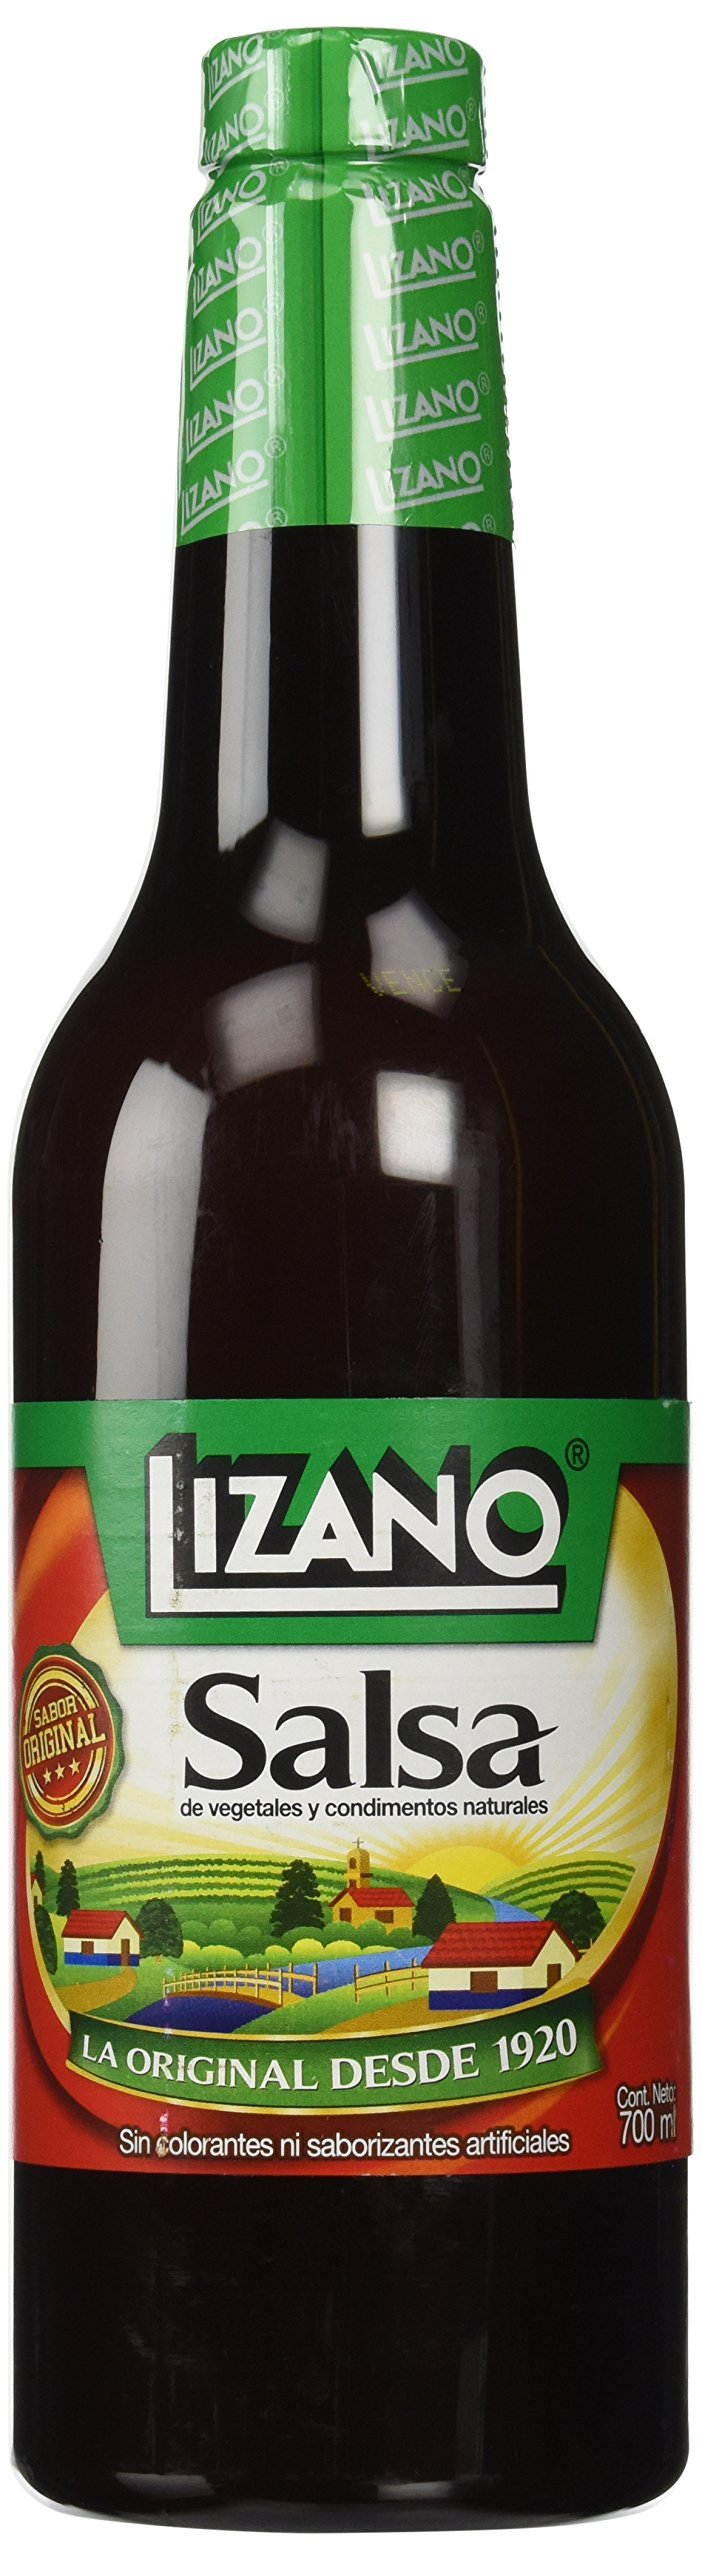 Lizano Salsa 700 mL - 2 bottles by Lizano